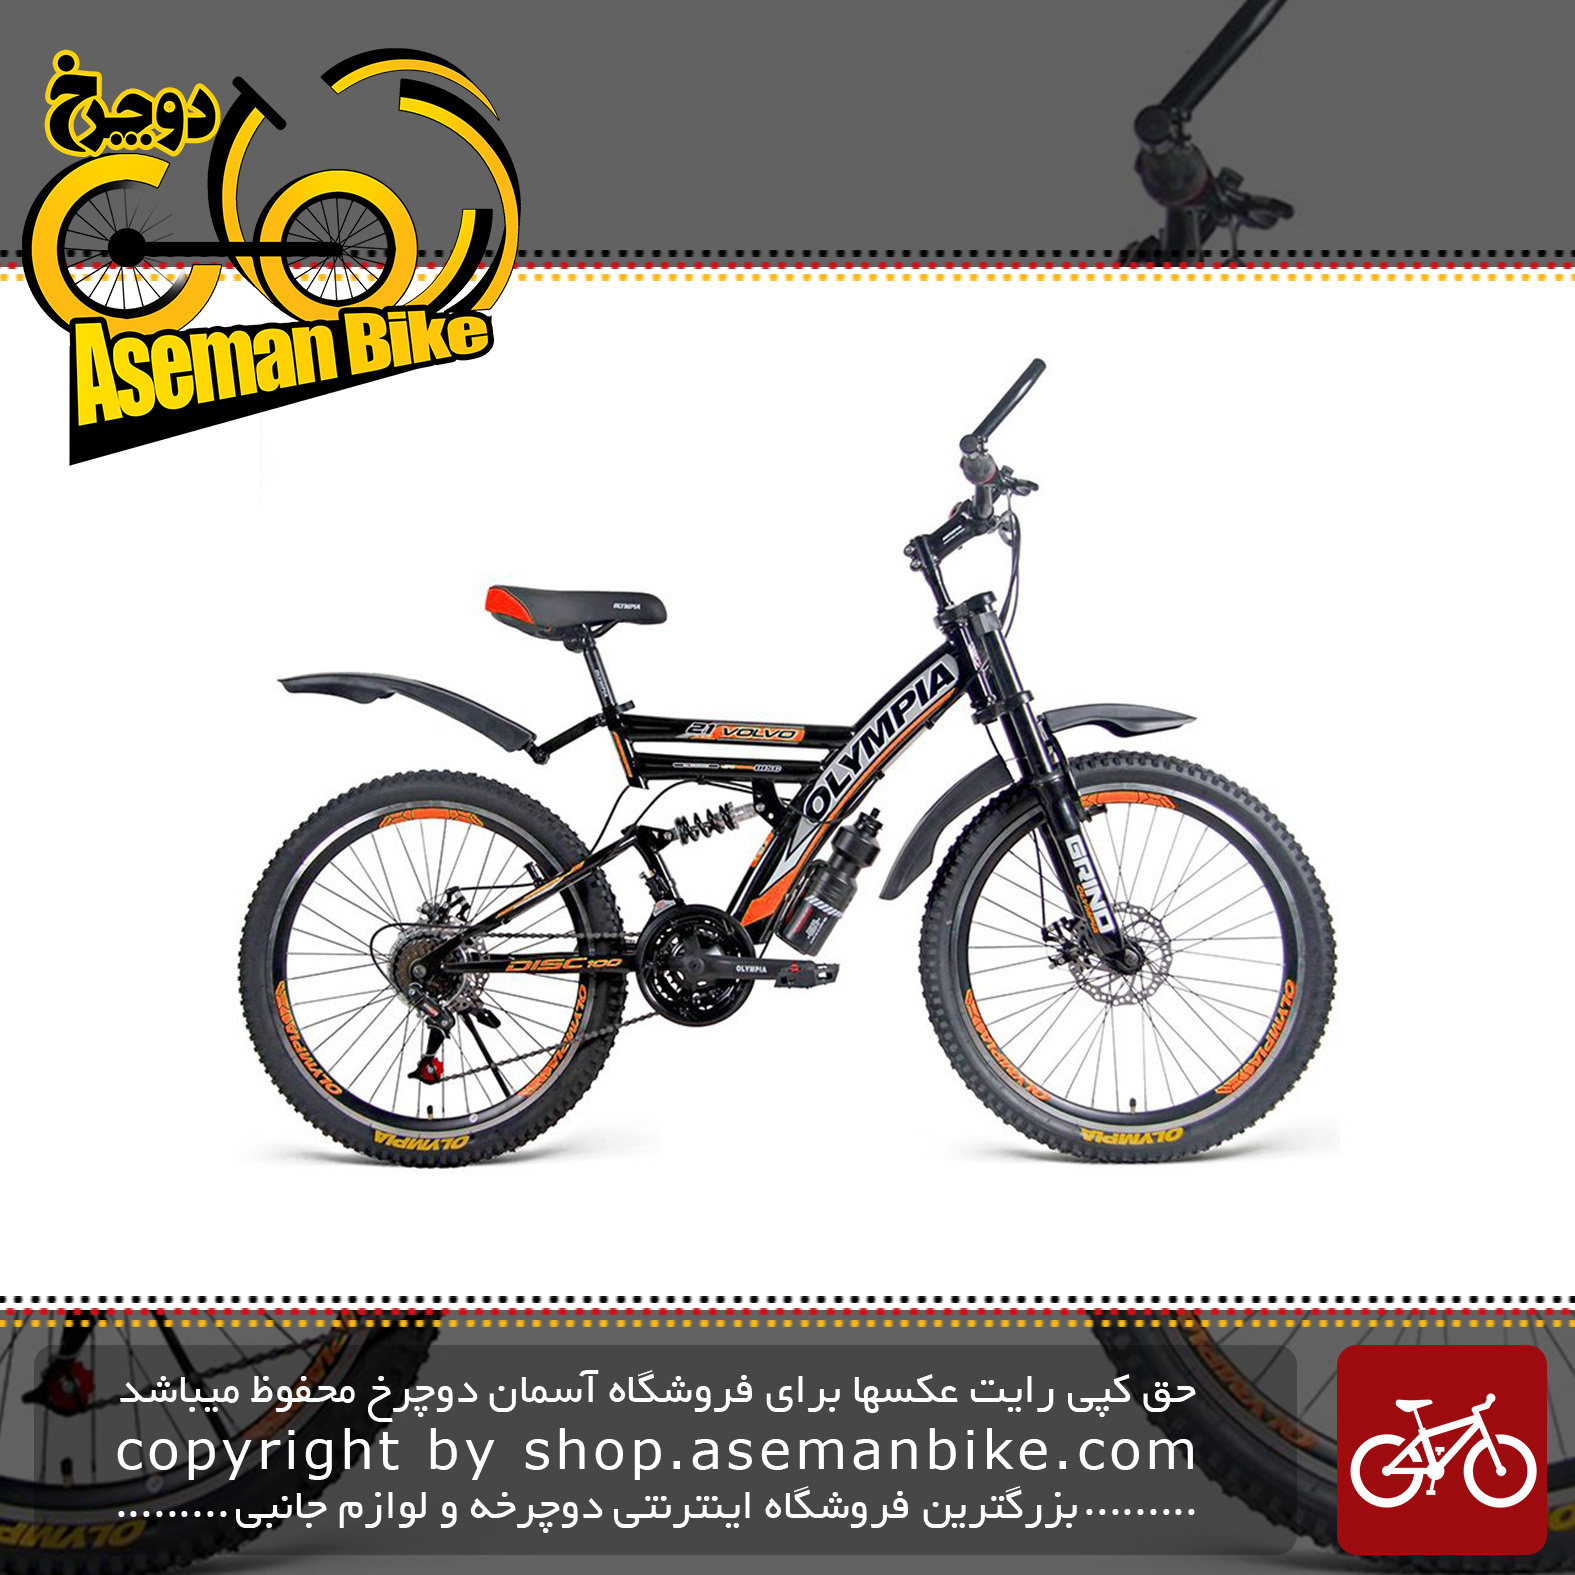 دوچرخه دو کمک کوهستان مدل 2423 سایز 24 Olympia 2423 Mountain Bicycle Size 24